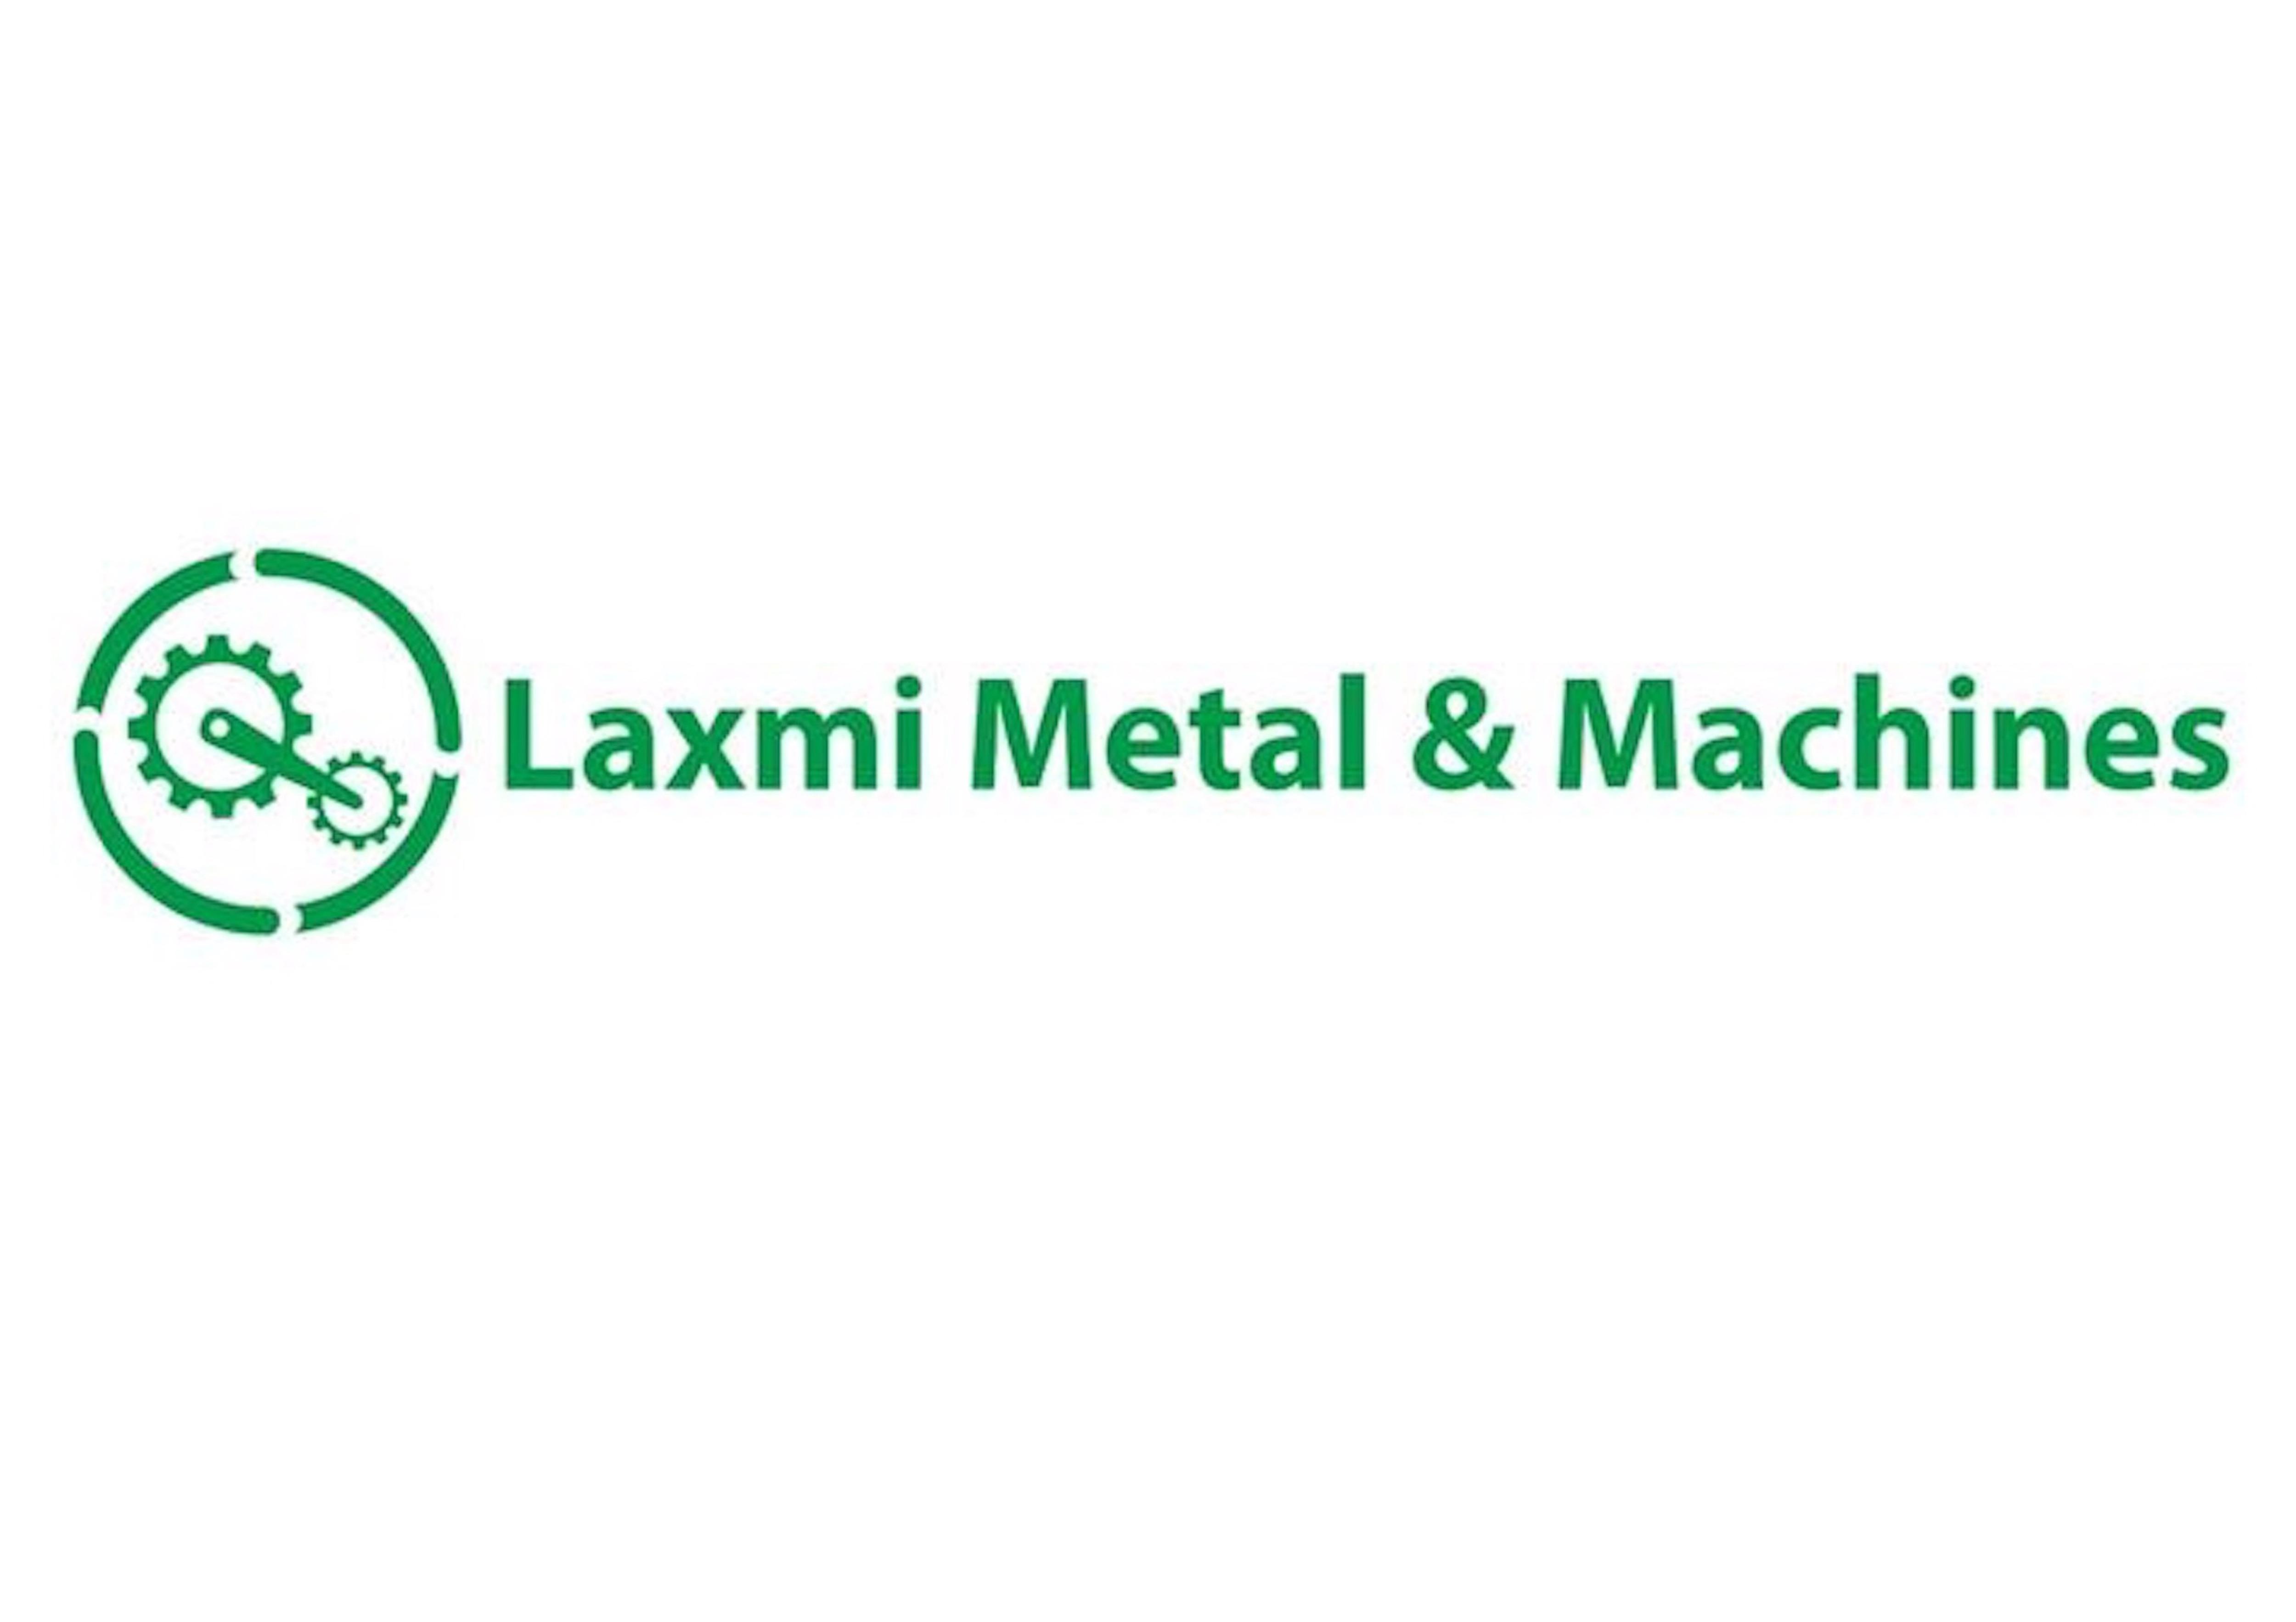 LAXMI METAL & MACHINES PRIVATE LIMITED